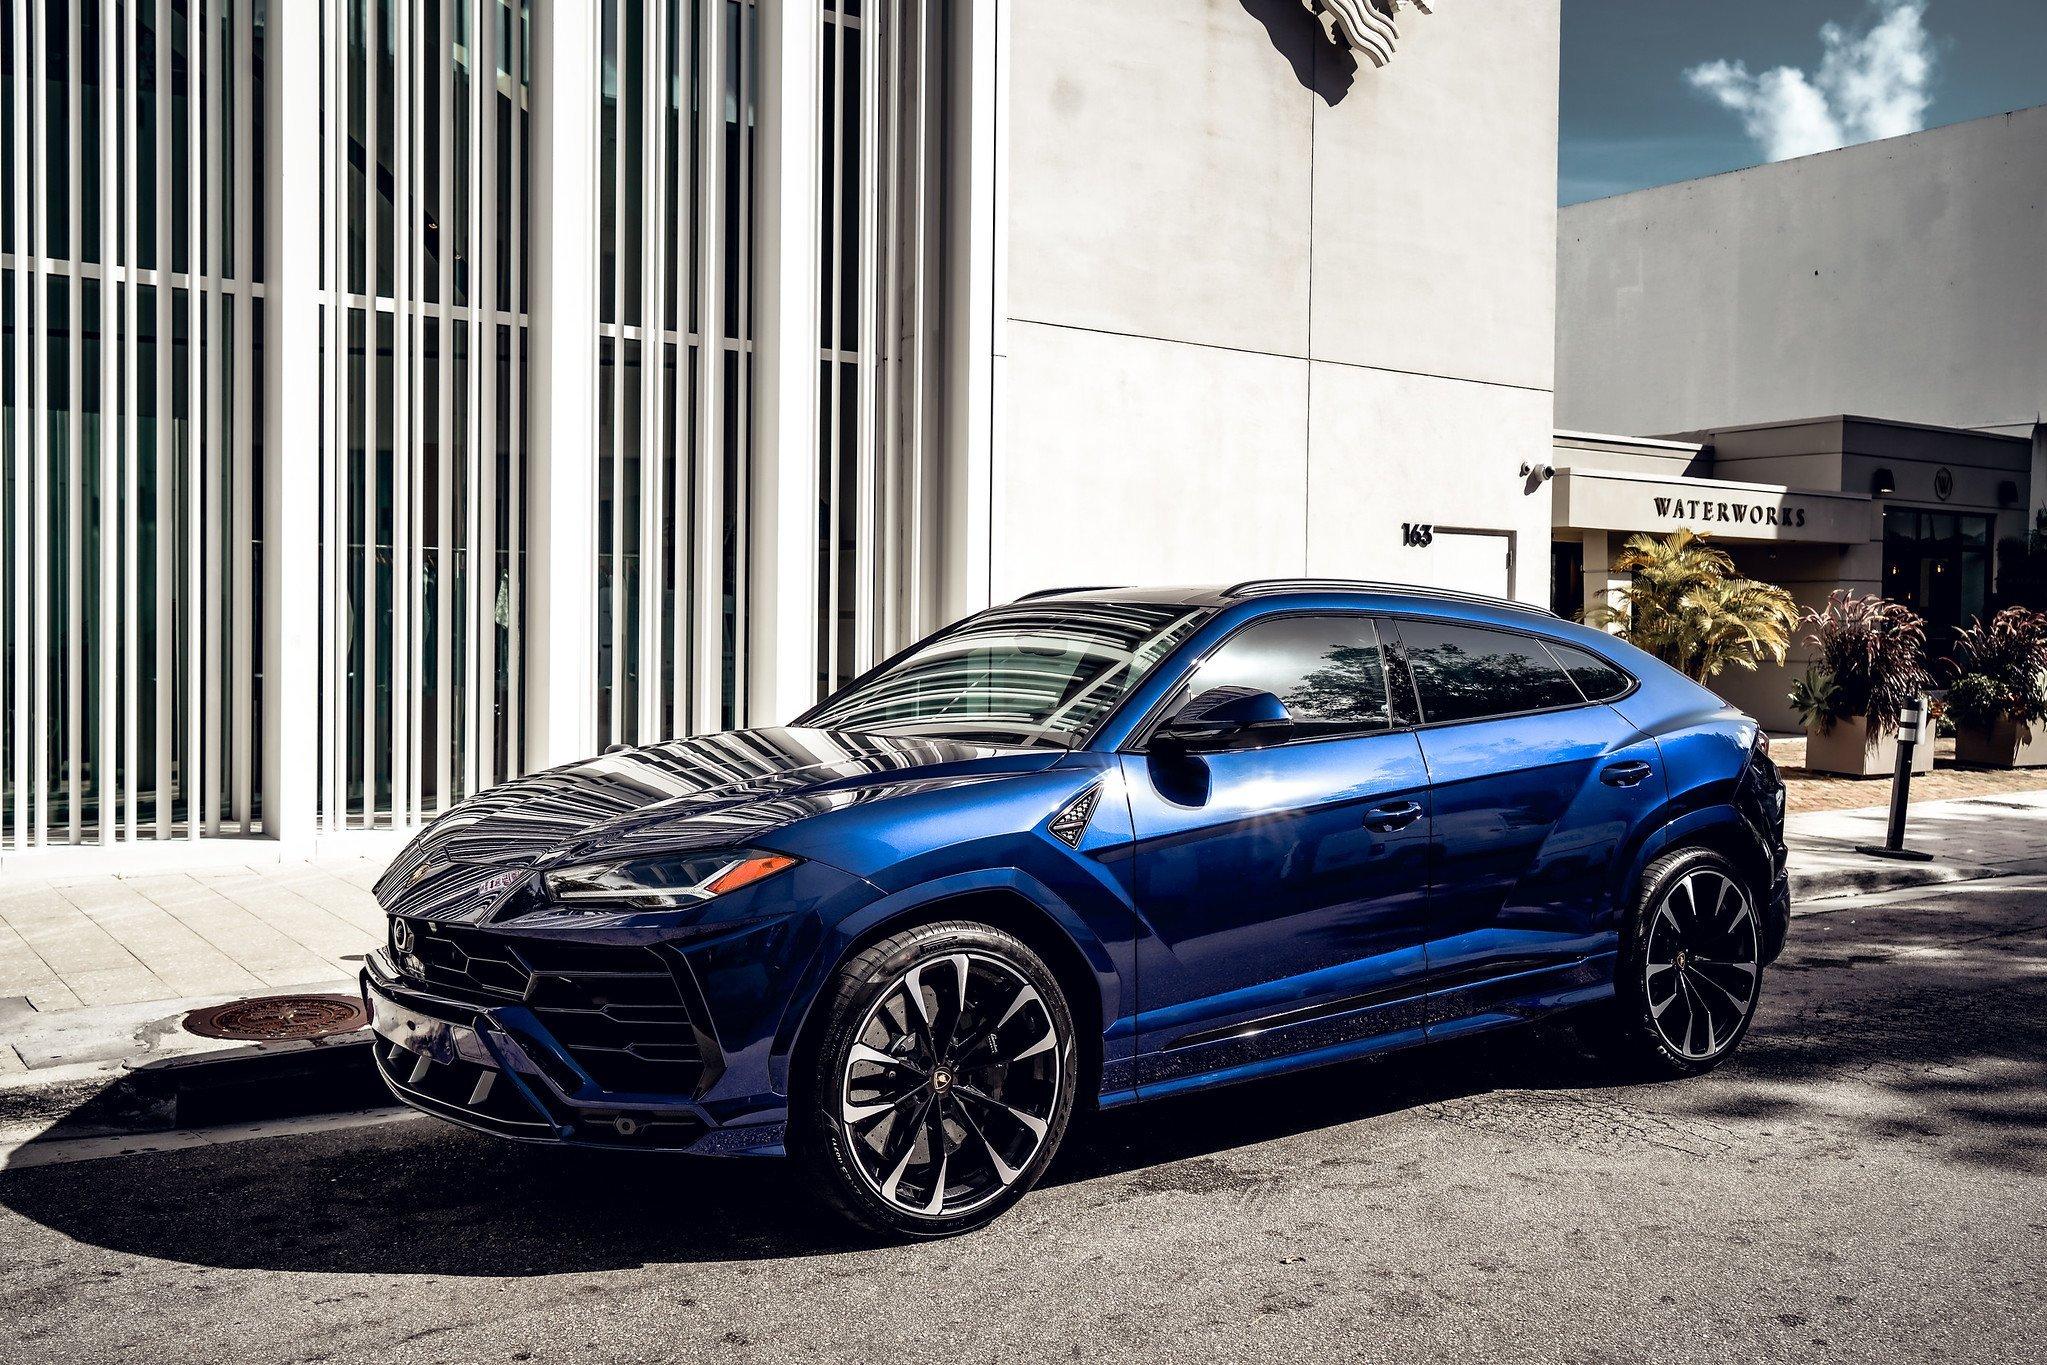 Image #0 of our  2021 Lamborghini Urus - Dark Blue    In Miami Fort Lauderdale Palm Beach South Florida